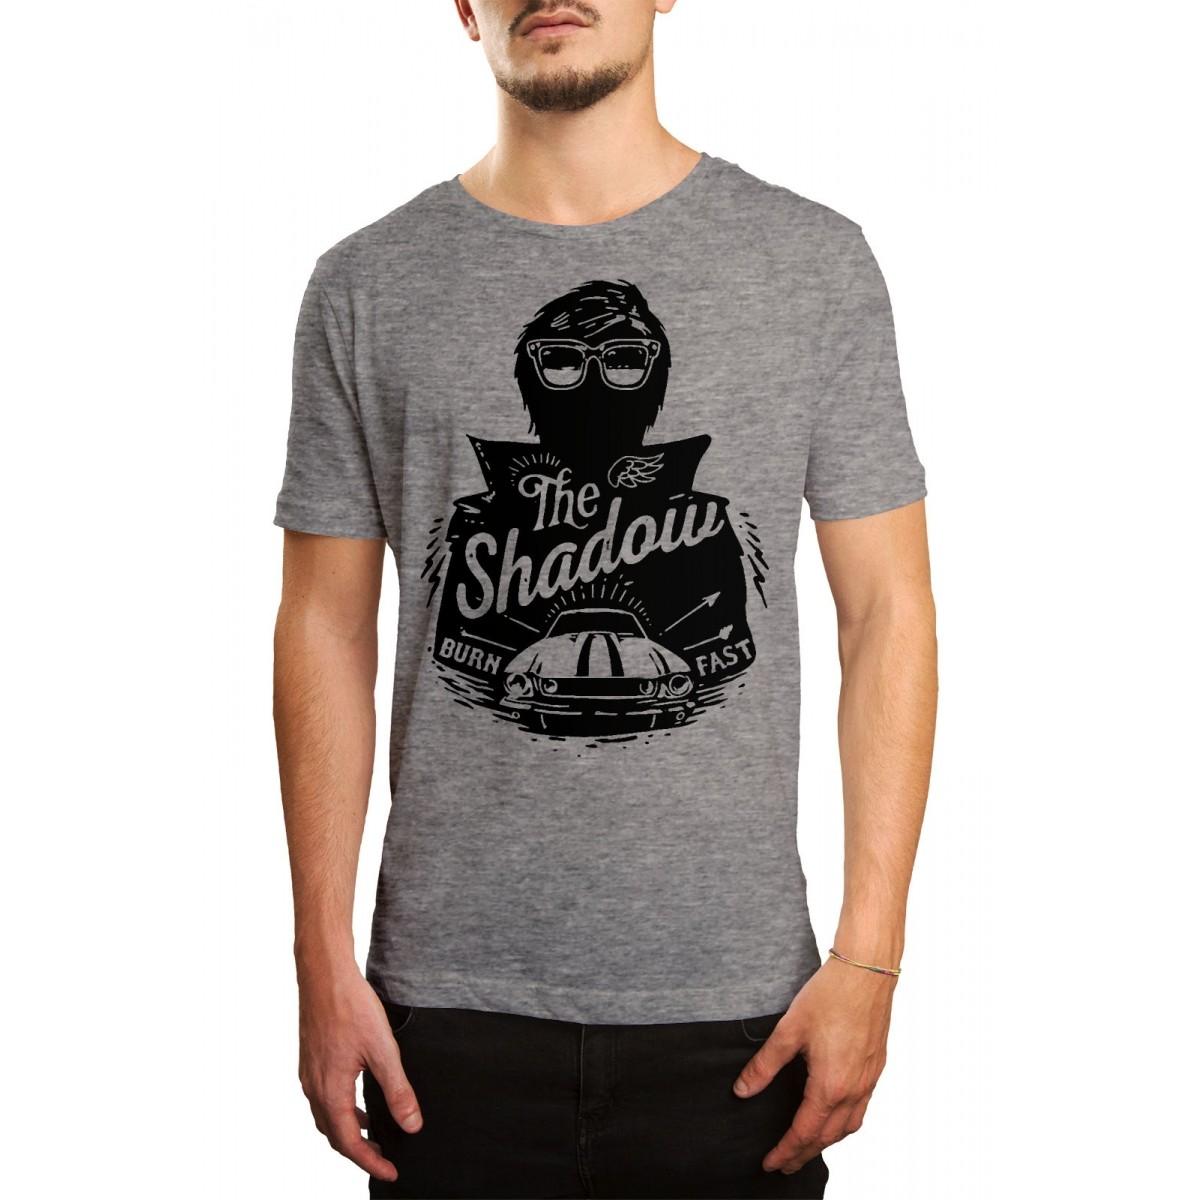 Camiseta HShop Burn  Fast Cinza  - HShop